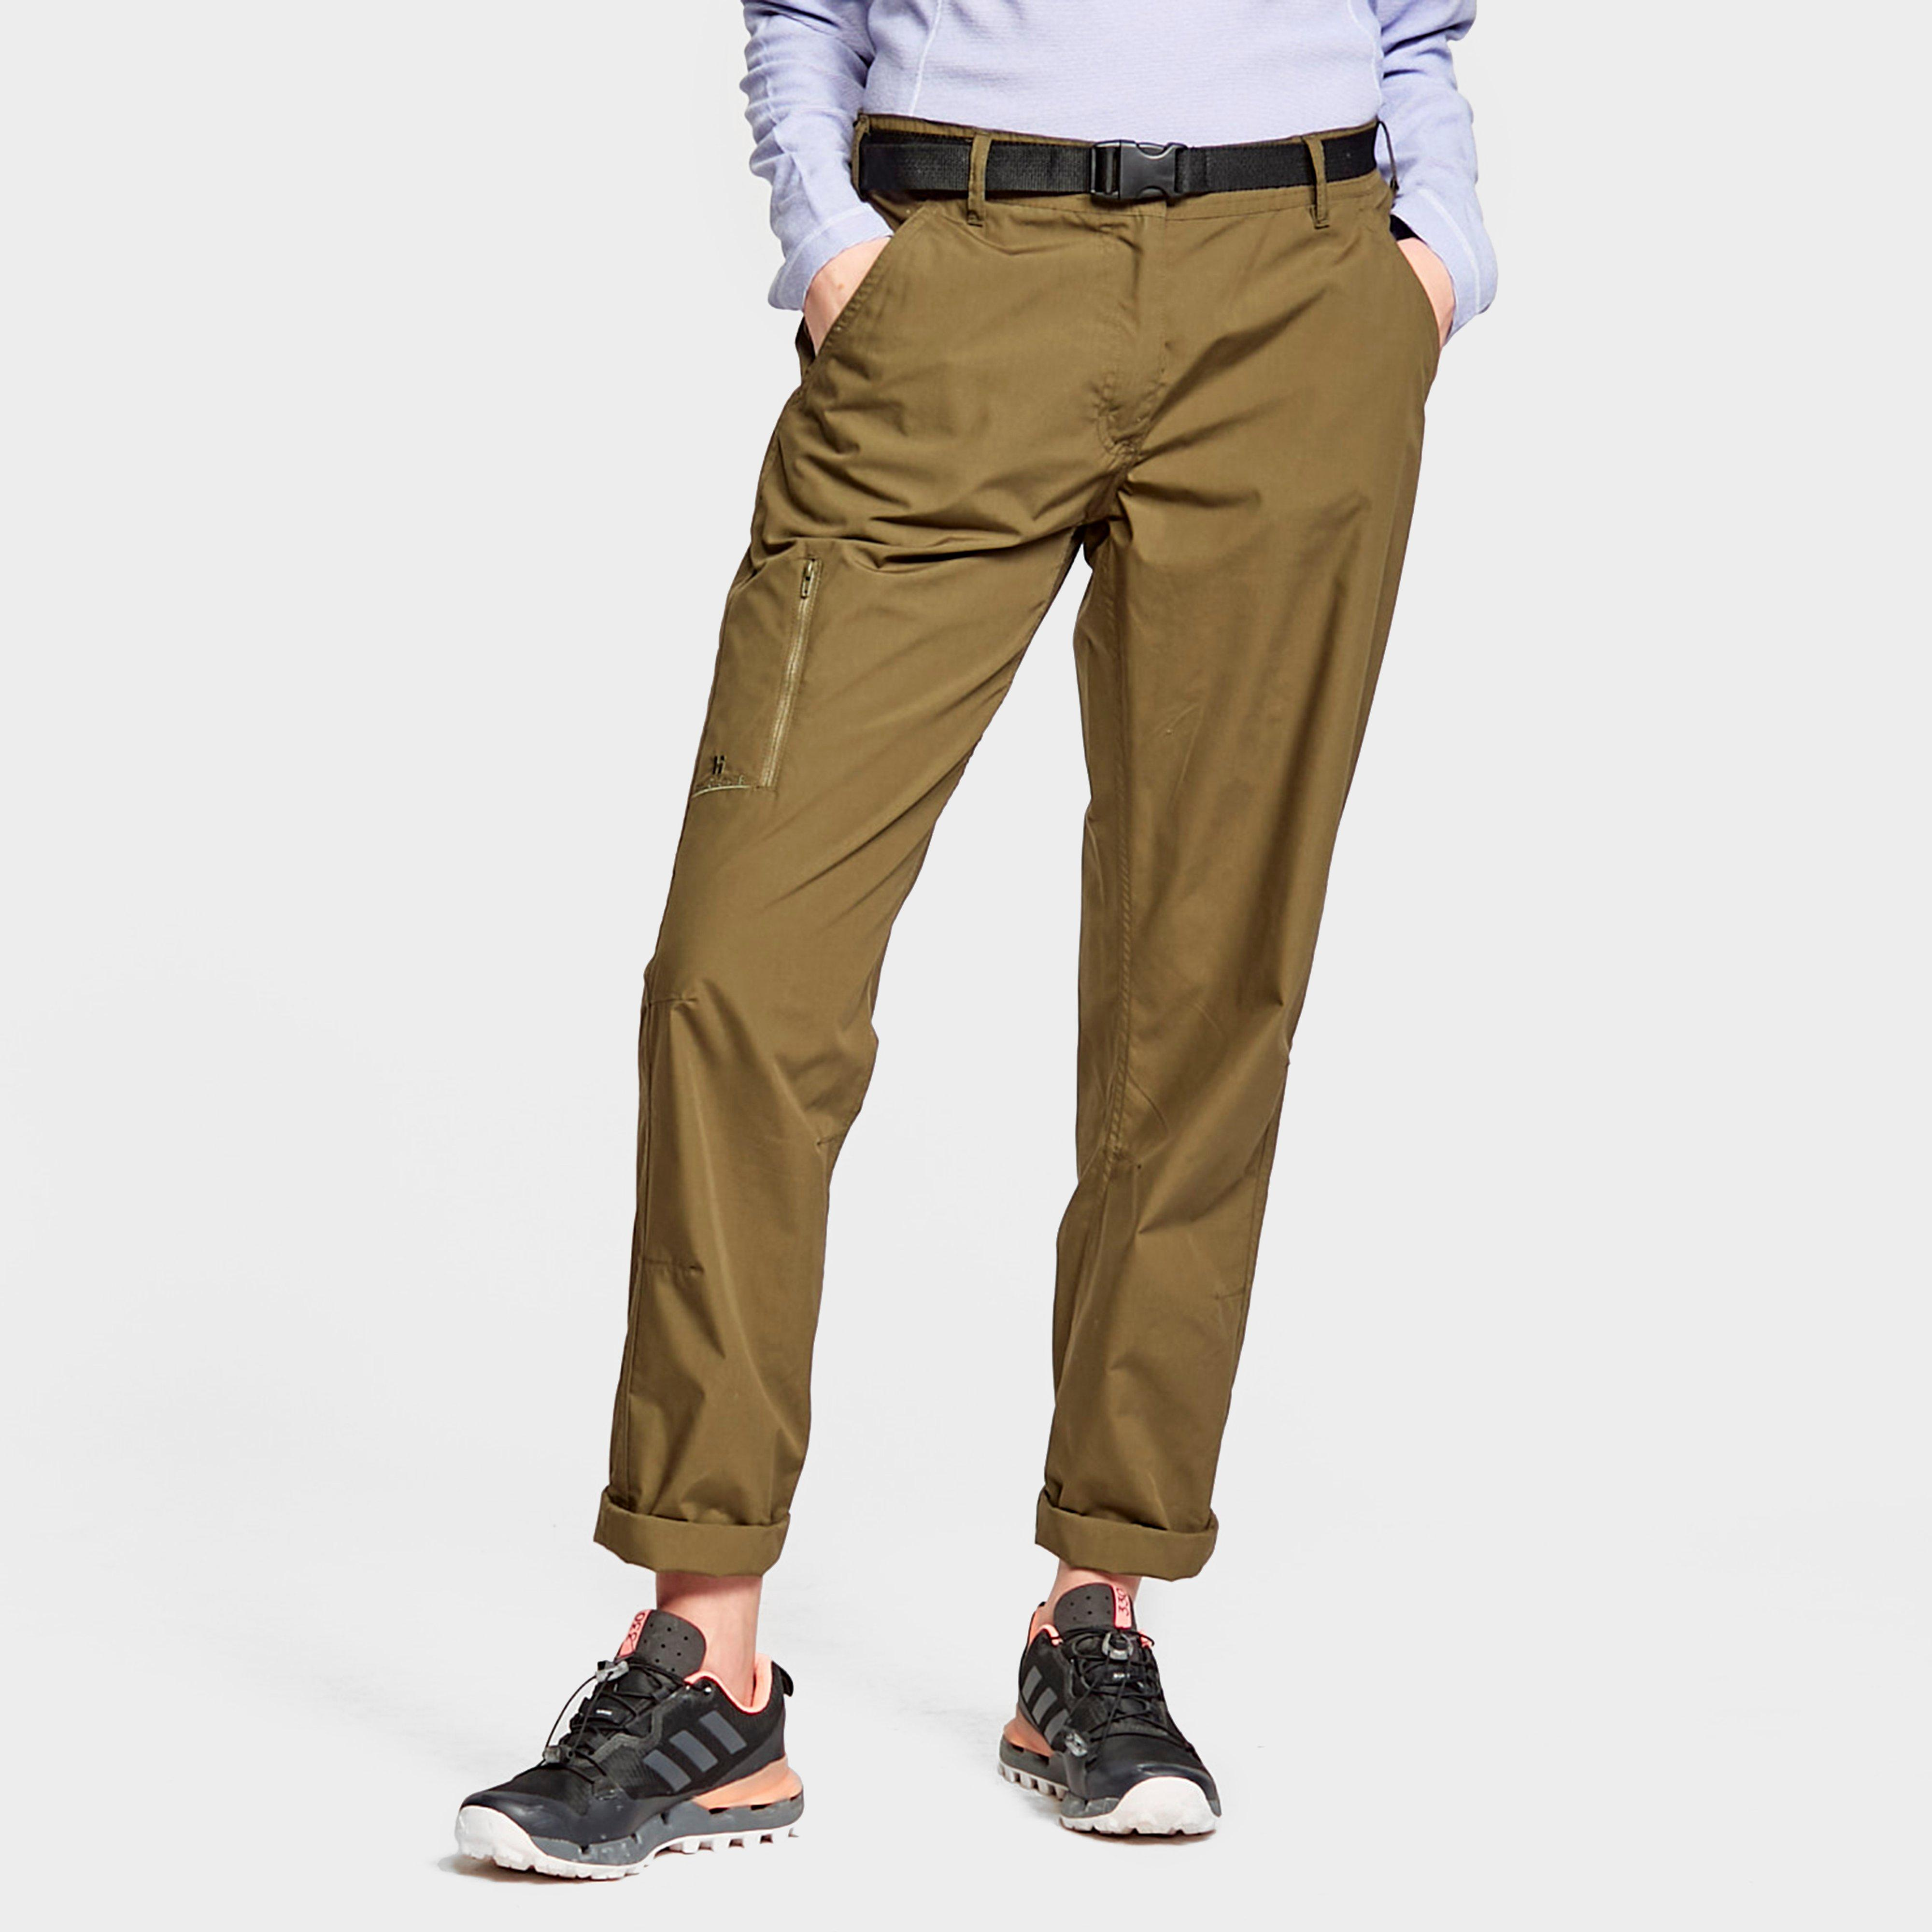 Hi-Gear Women's Nebraska Ii Walking Trousers - Khaki/Wmns, Khaki